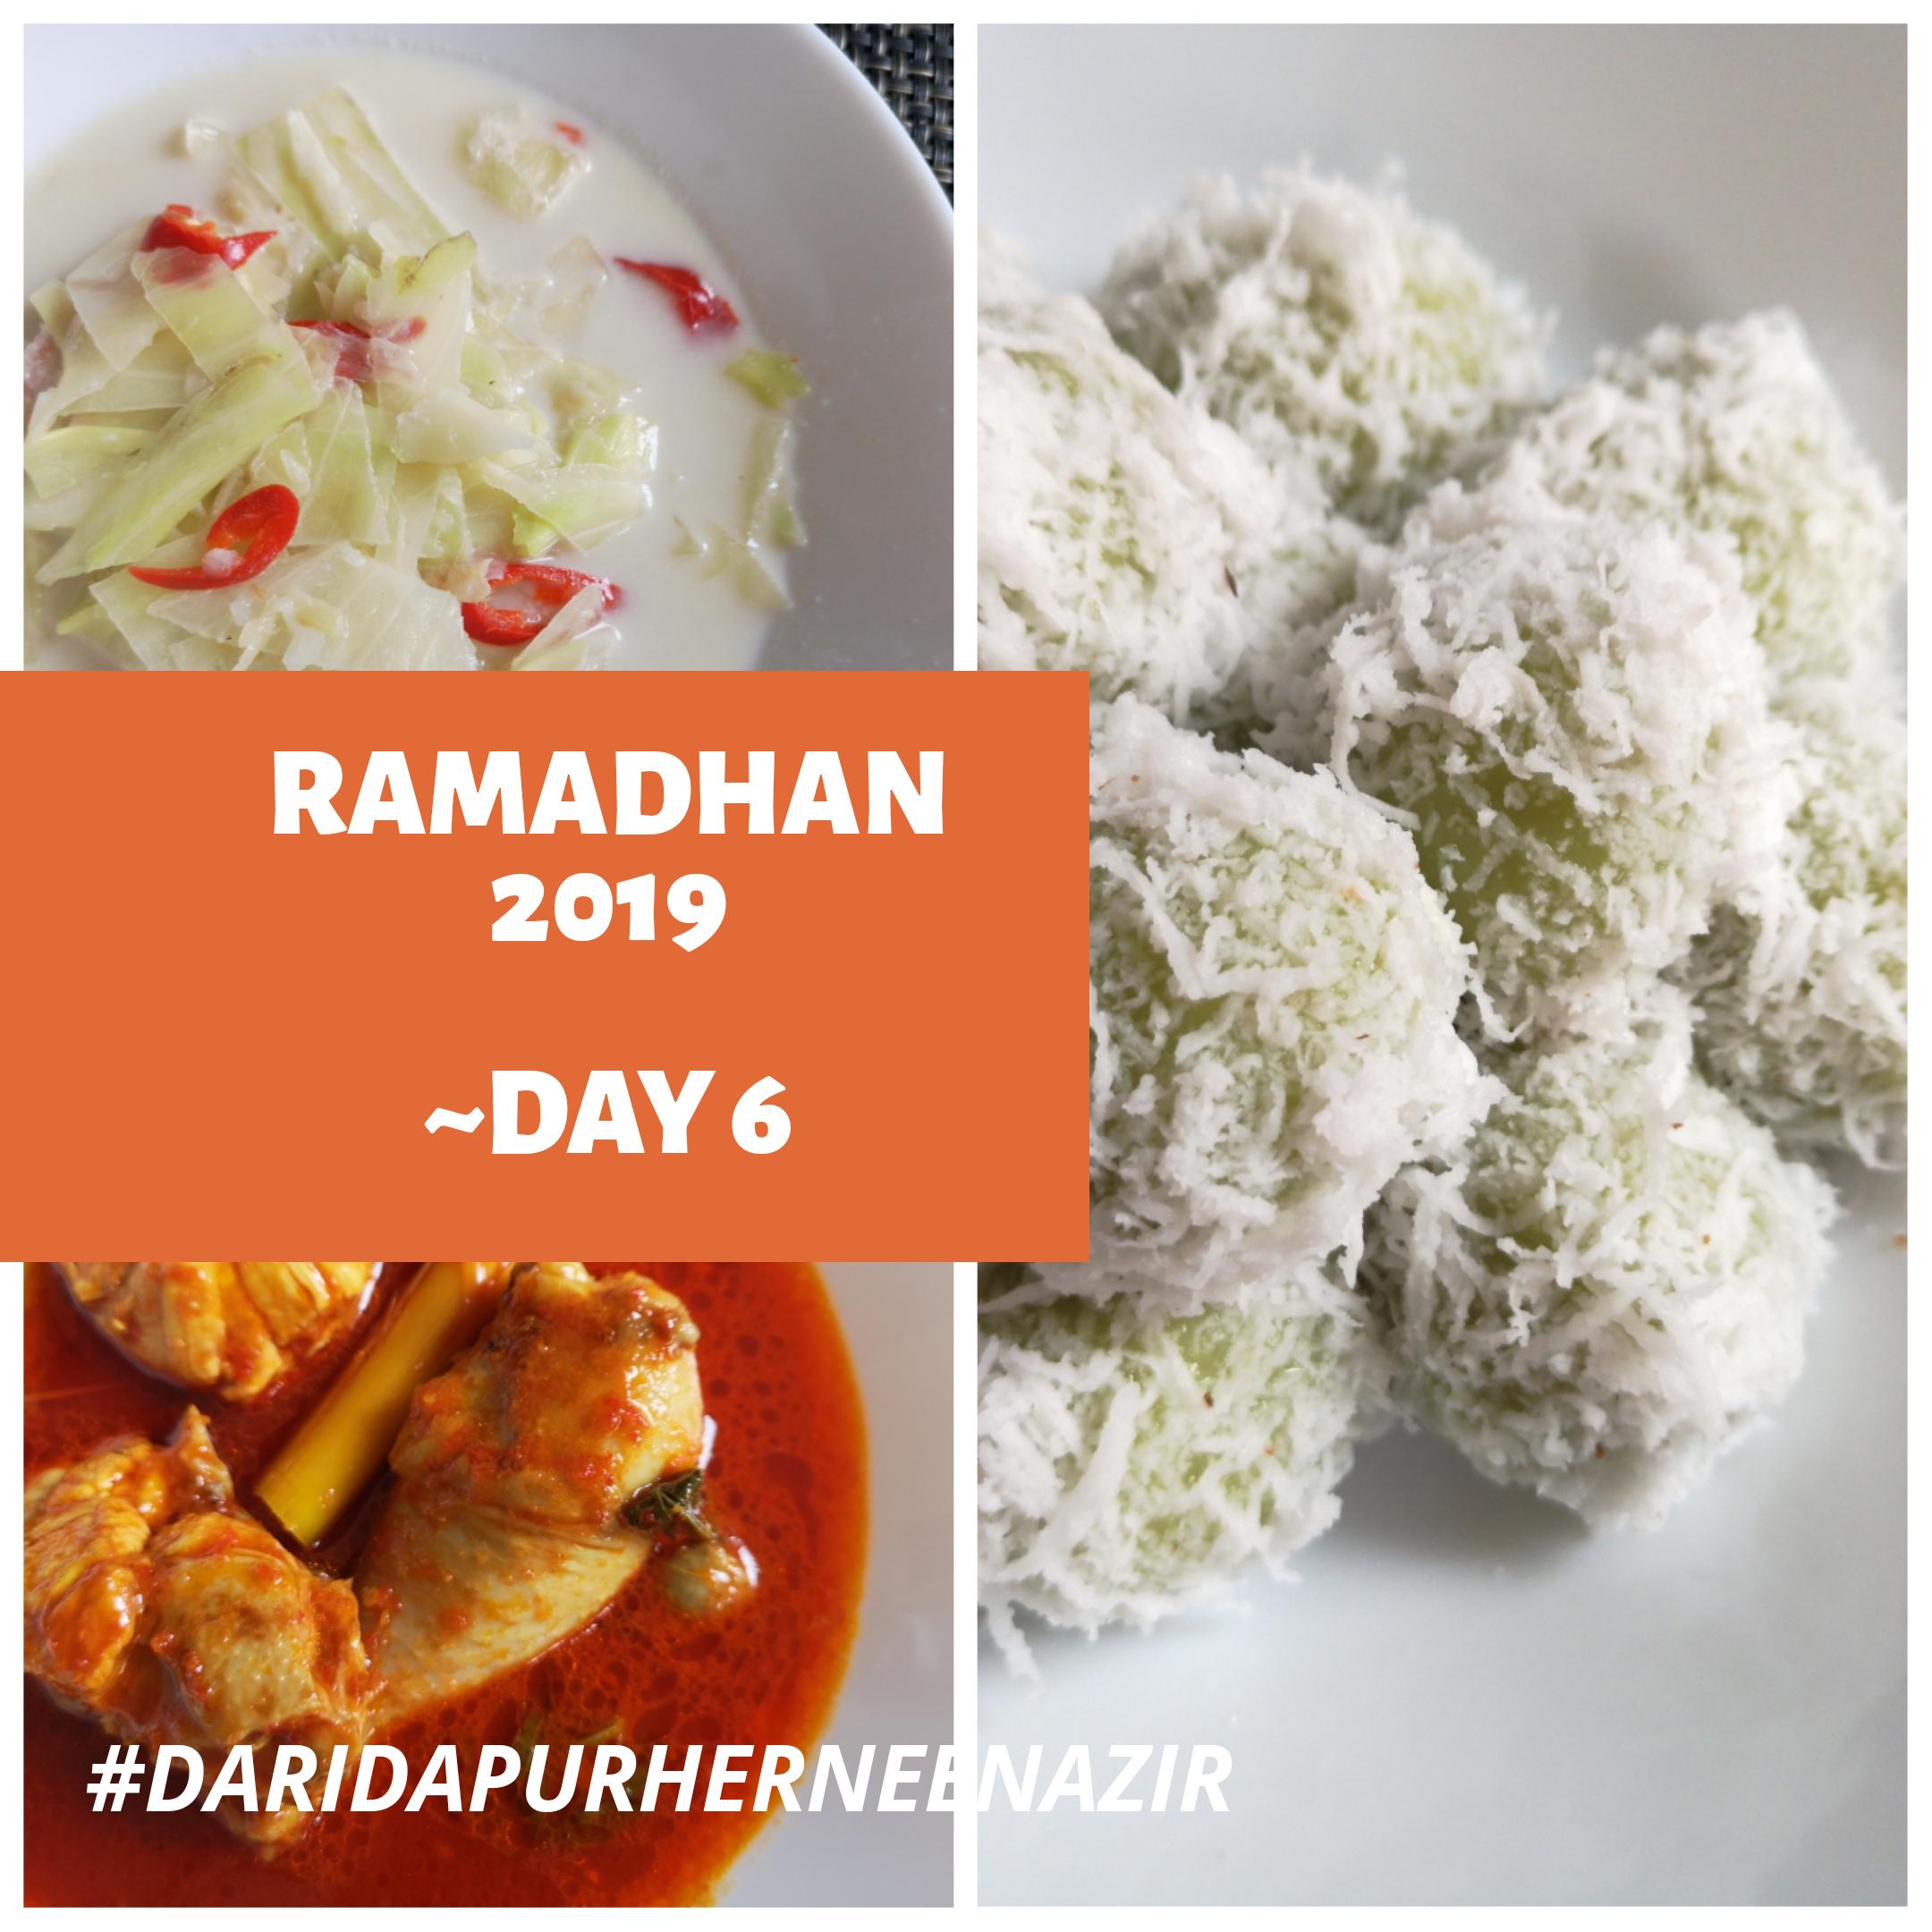 Ramadhan 2019 – Day 6